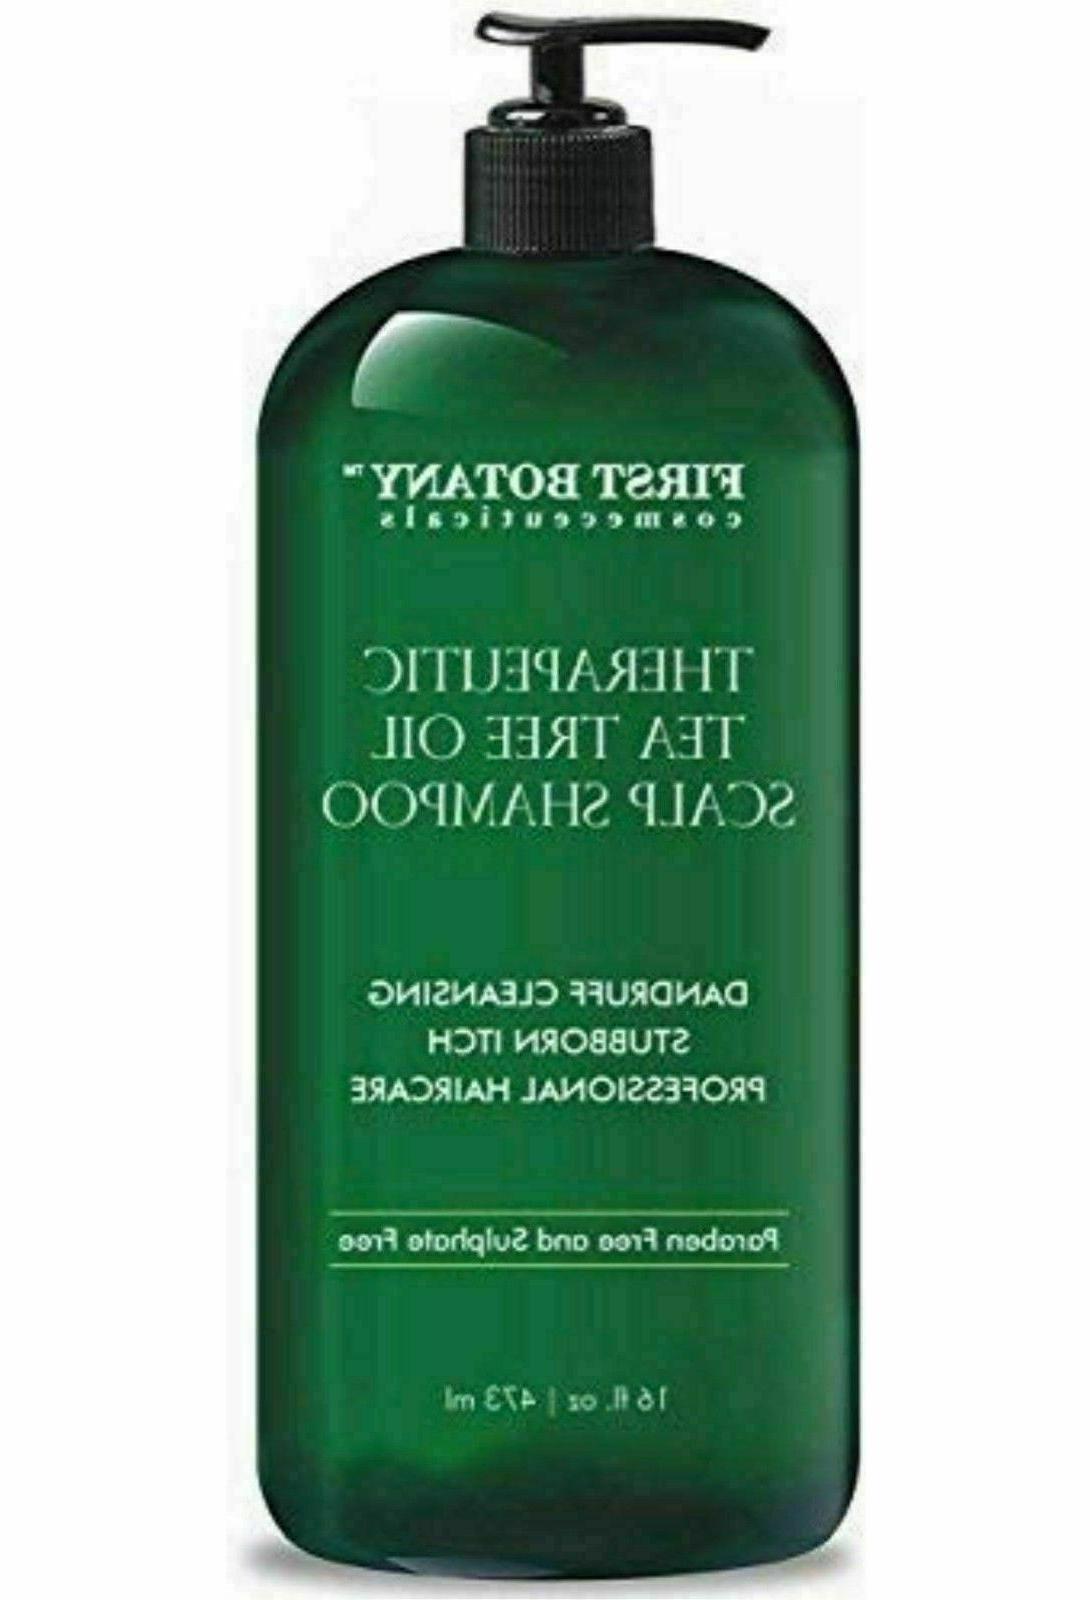 Tea Tree Oil Shampoo 16 fl oz Anti Dandruff Natural For Dry